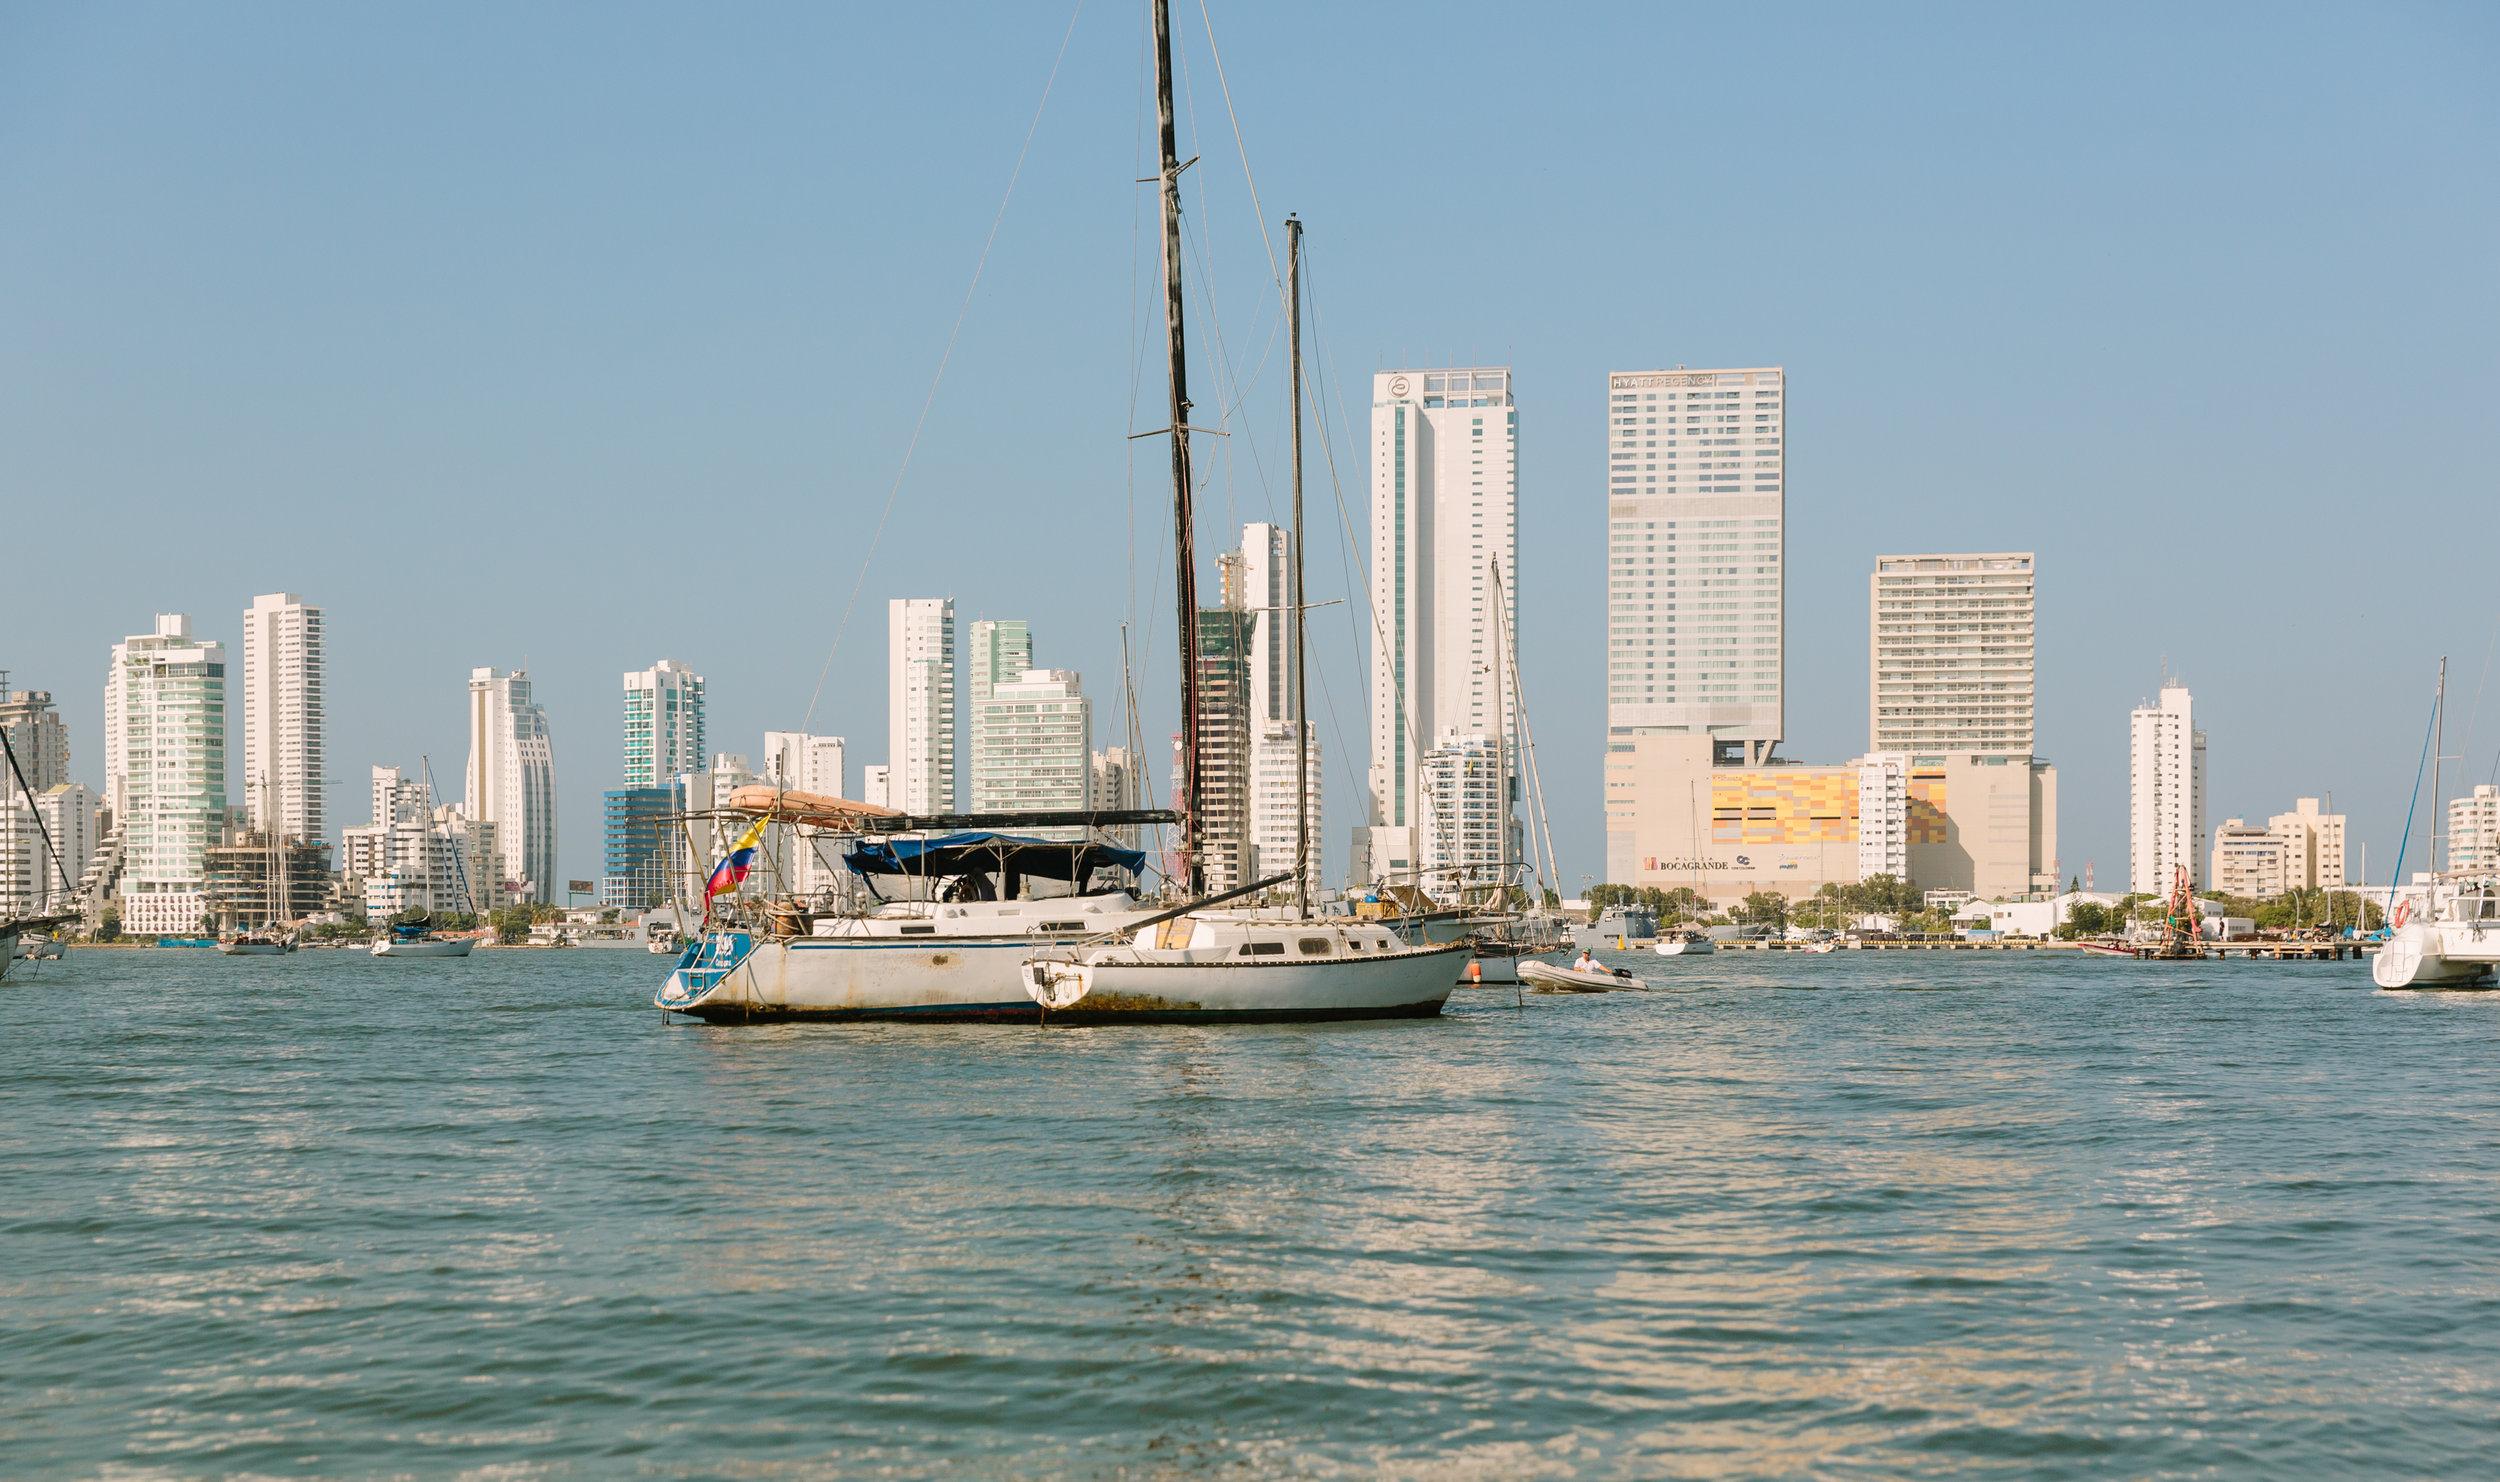 The Bay of Cartagena